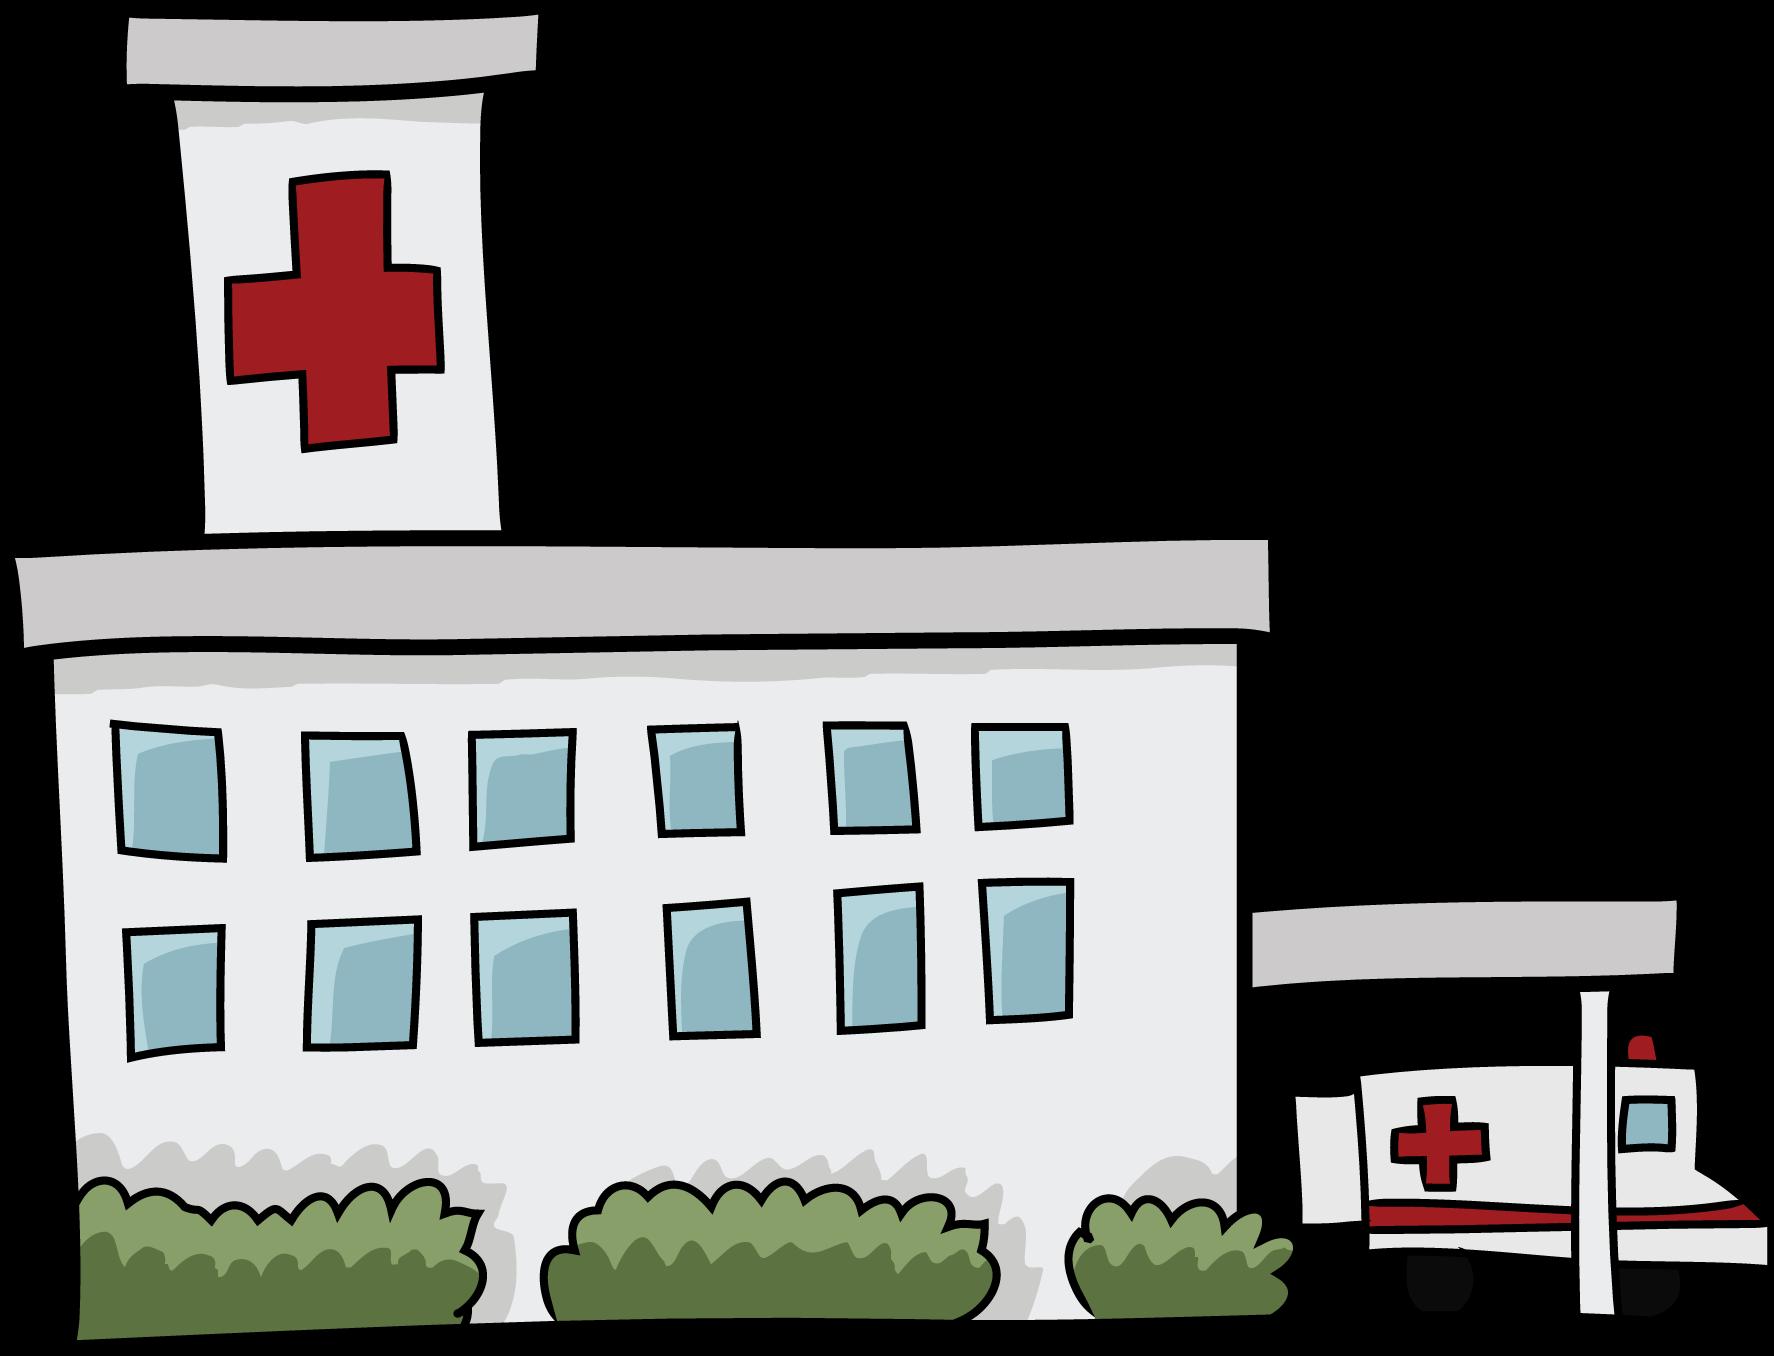 MICS Hospital